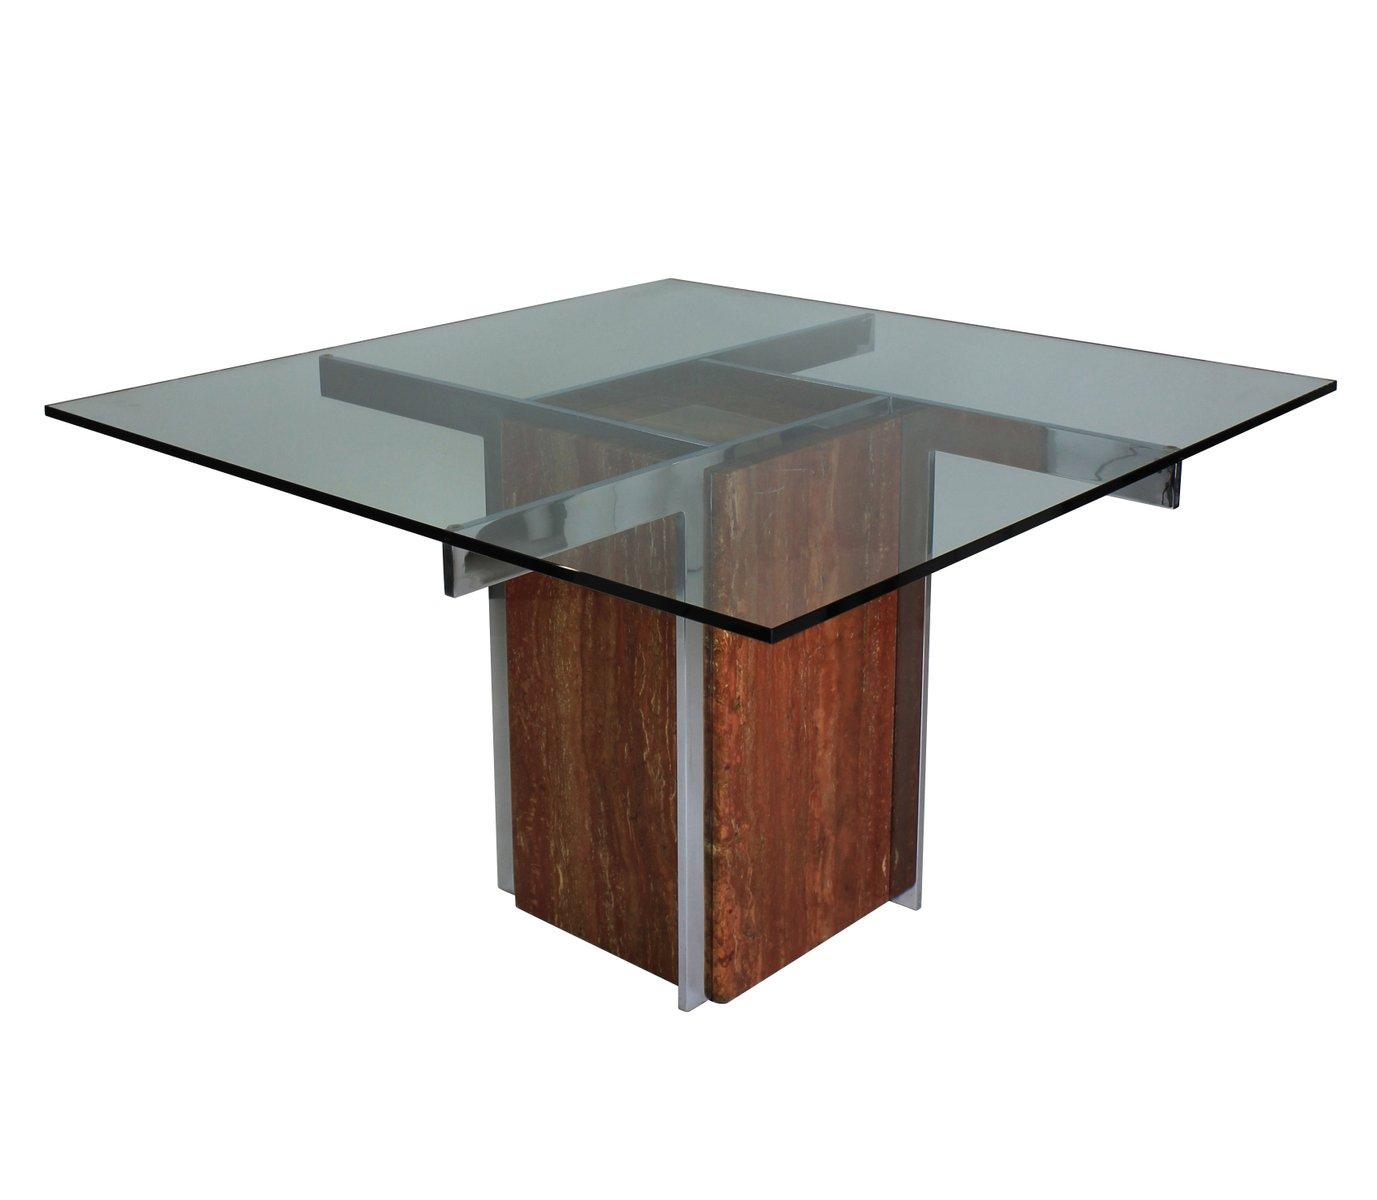 table de salle manger moderniste en marbre et en chrome 1960s en vente sur pamono. Black Bedroom Furniture Sets. Home Design Ideas